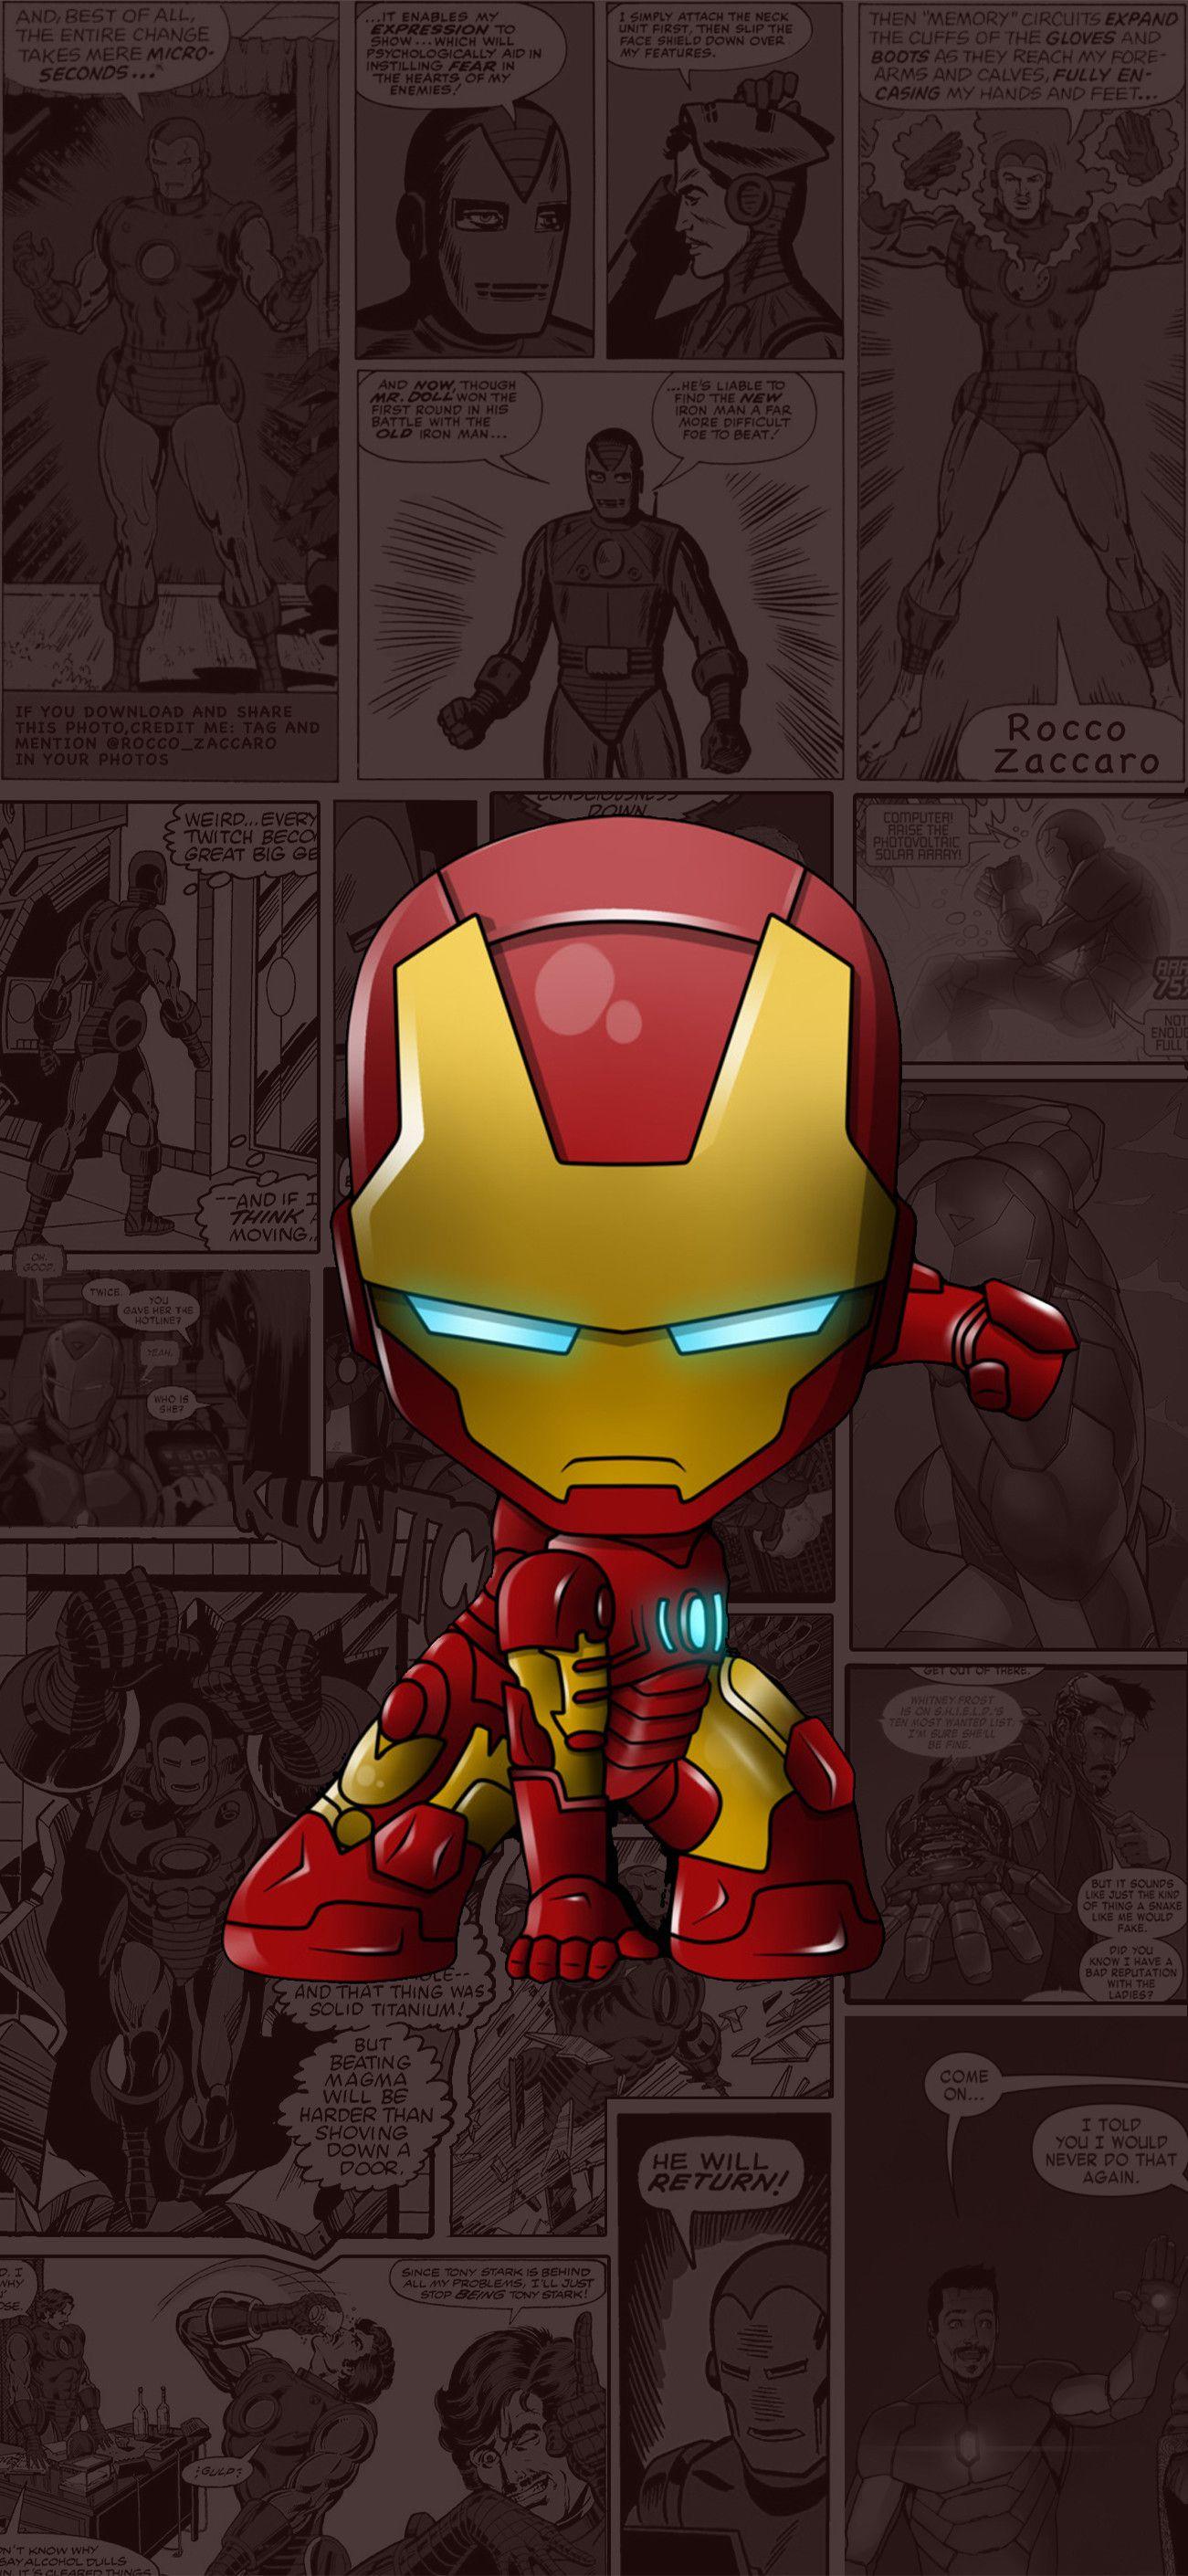 Wallpaper Iphone Xs Max 50 Marvel Wallpaper Hd Iron Man Cartoon Superhero Wallpaper